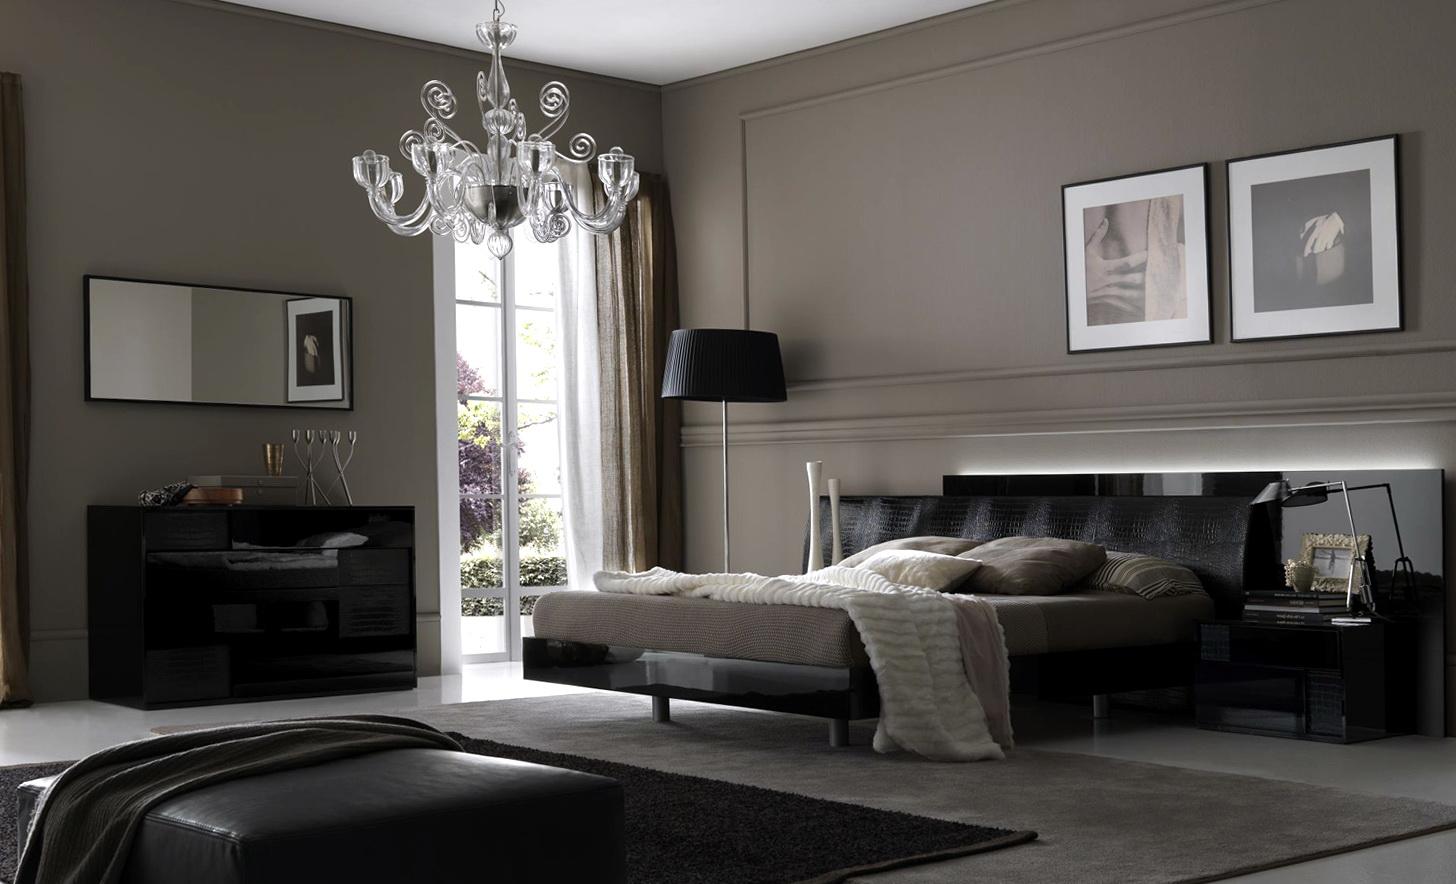 Bedroom Decor Ideas 2014